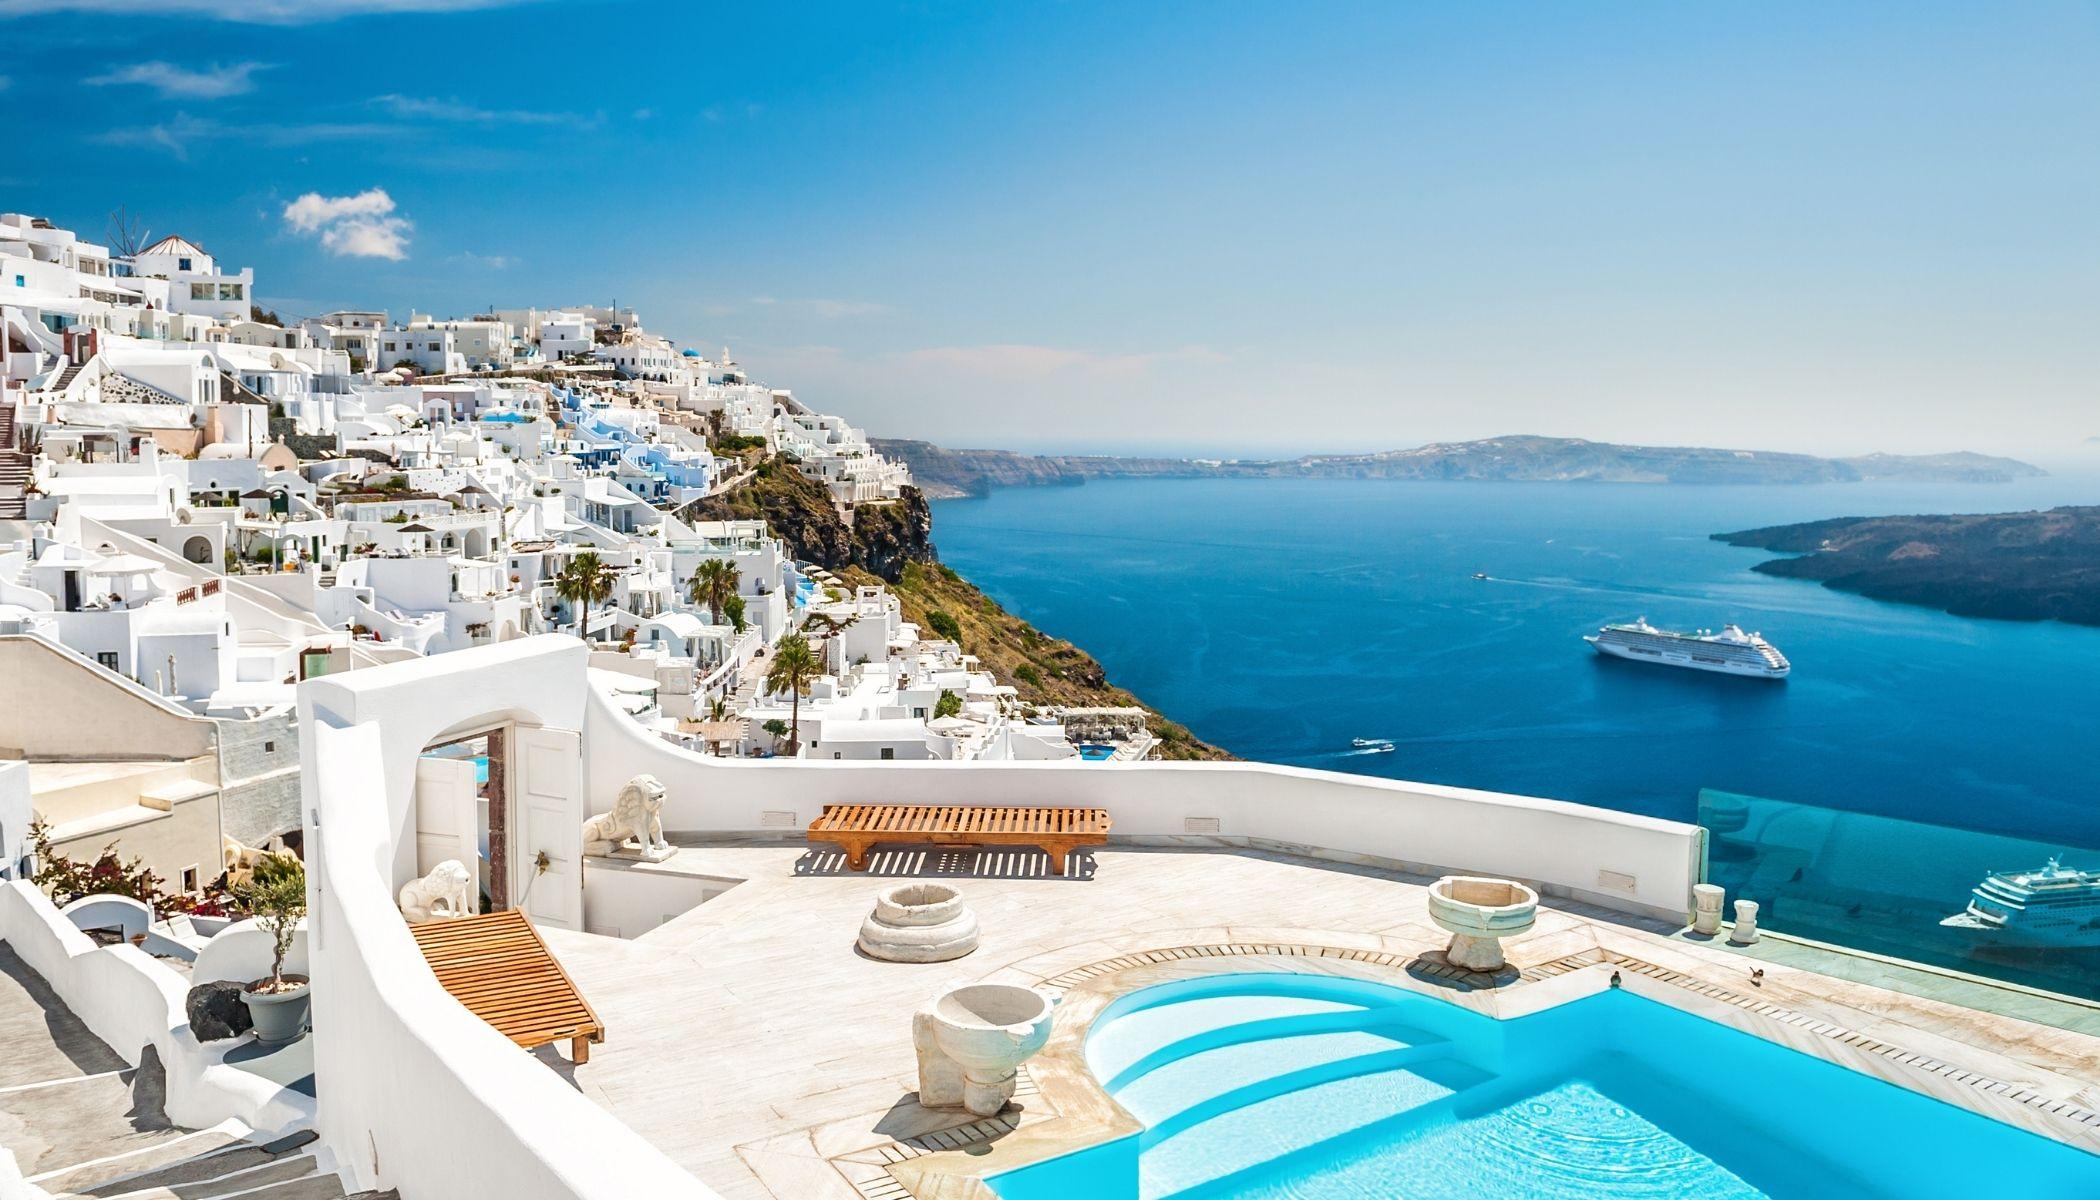 Santorini Hotels 20 atemberaubende Orte   NoSt Travel